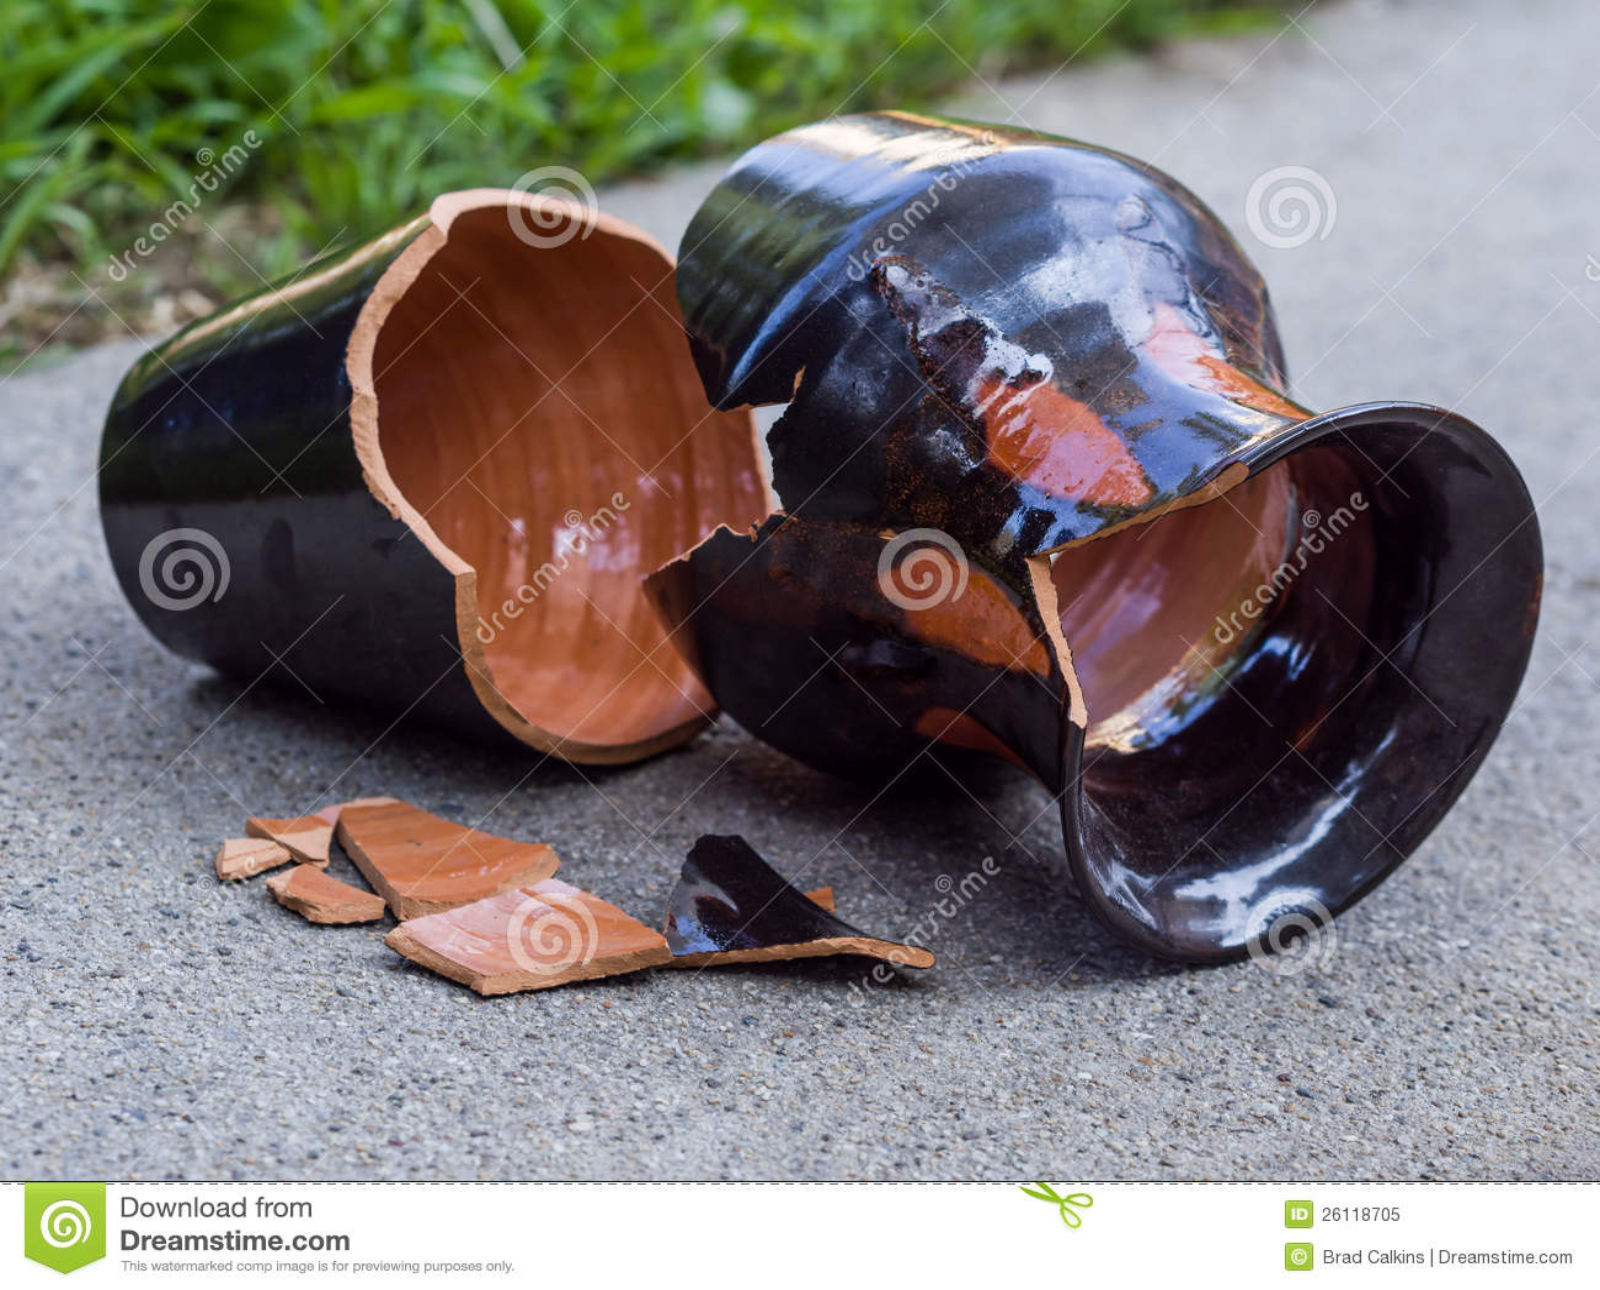 Broken Vase Royalty Free Stock Photo - Image: 26118705